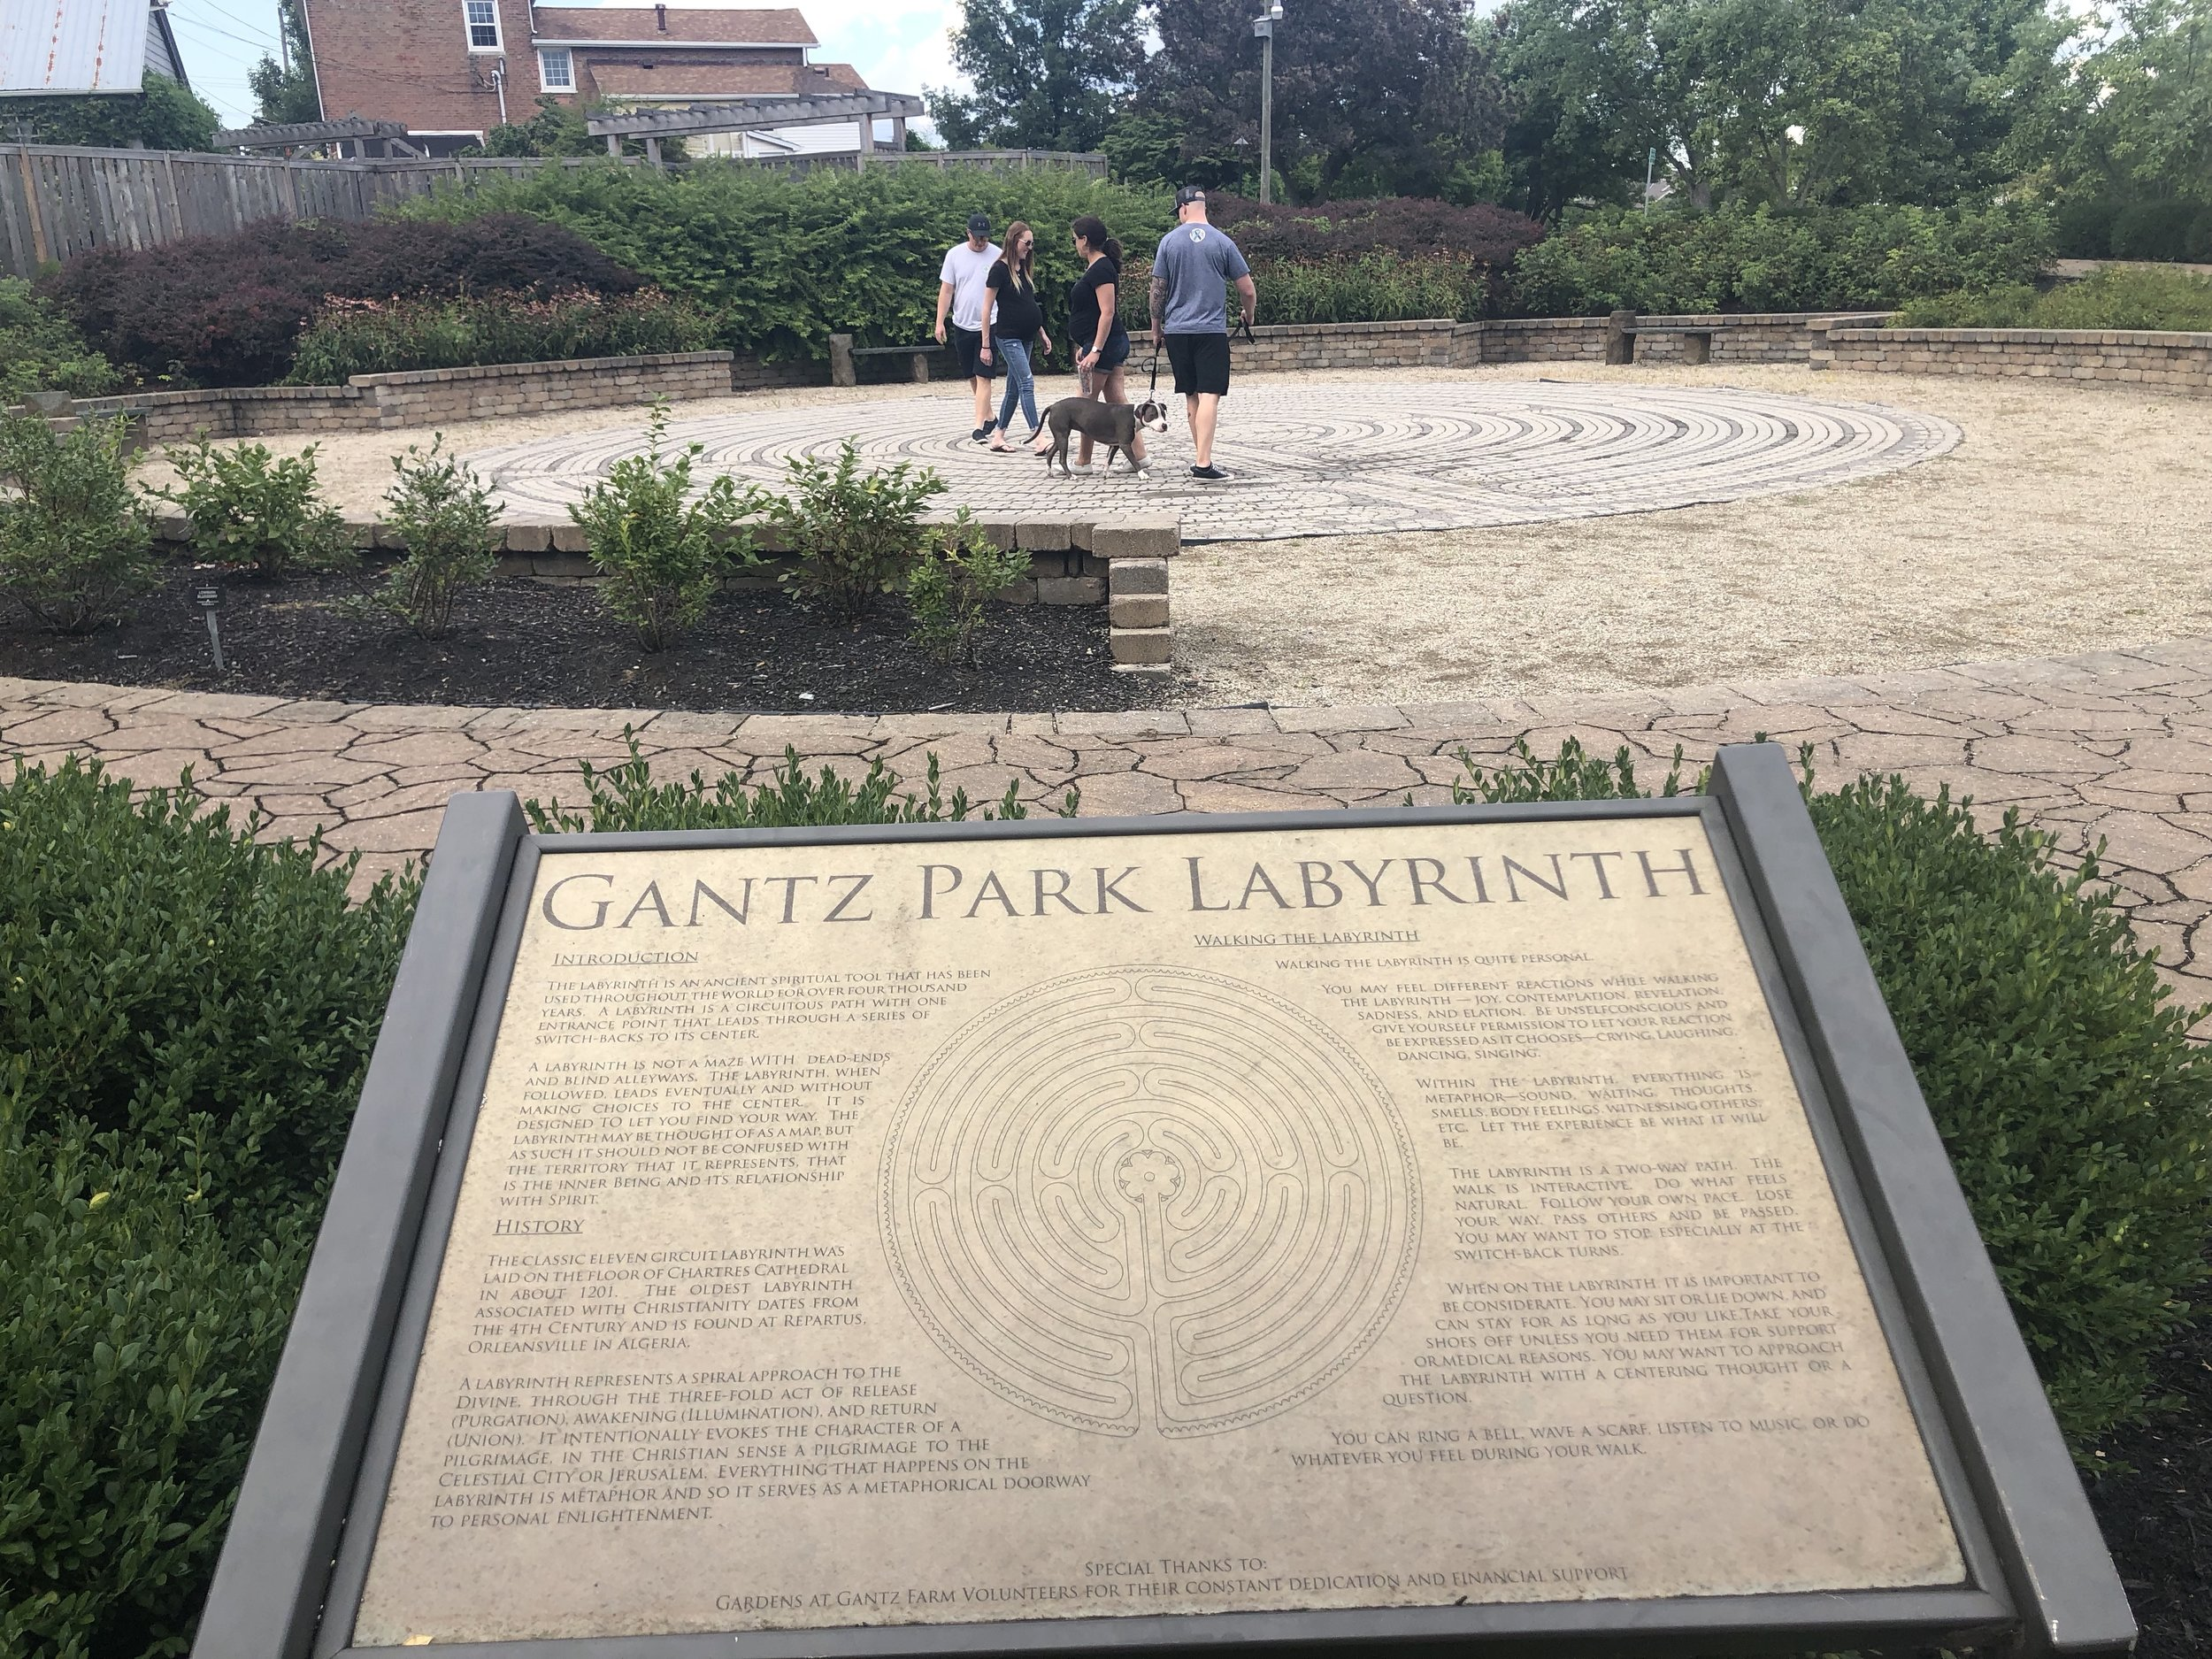 Walking the labyrinth at Gantz Park in Grove City